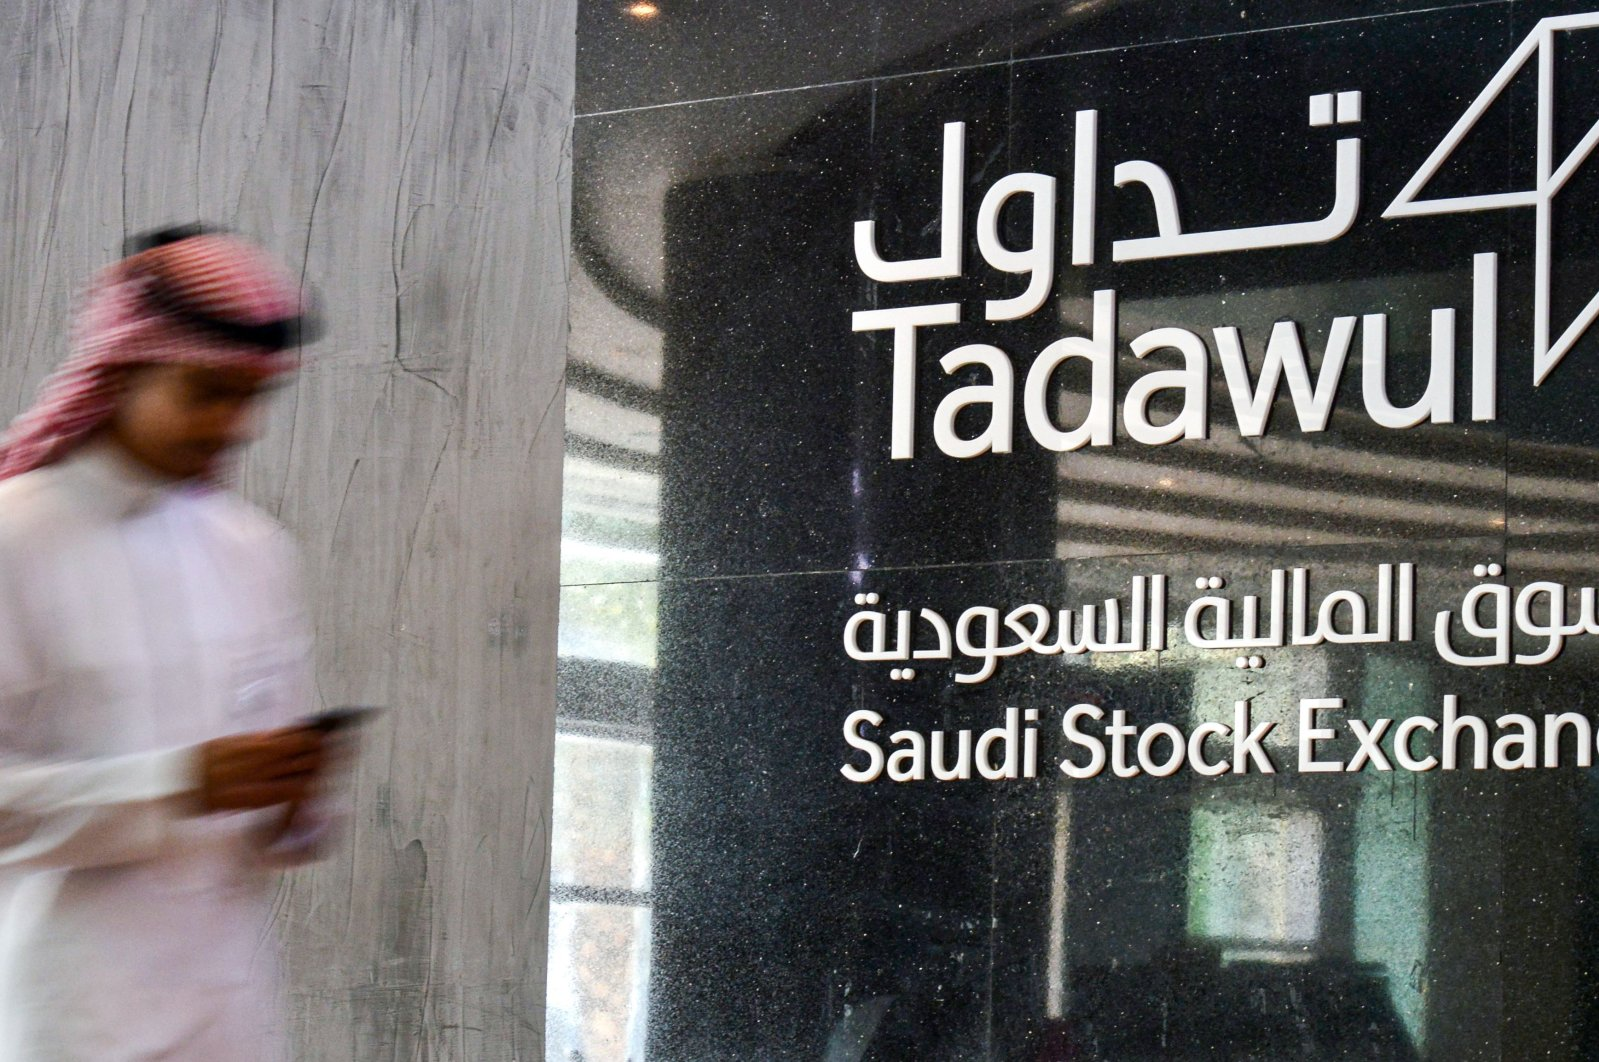 The logo of Saudi Arabia's Stock Exchange Market (Tadawul) bourse in the capital Riyadh, Dec. 12, 2019. (AFP Photo)